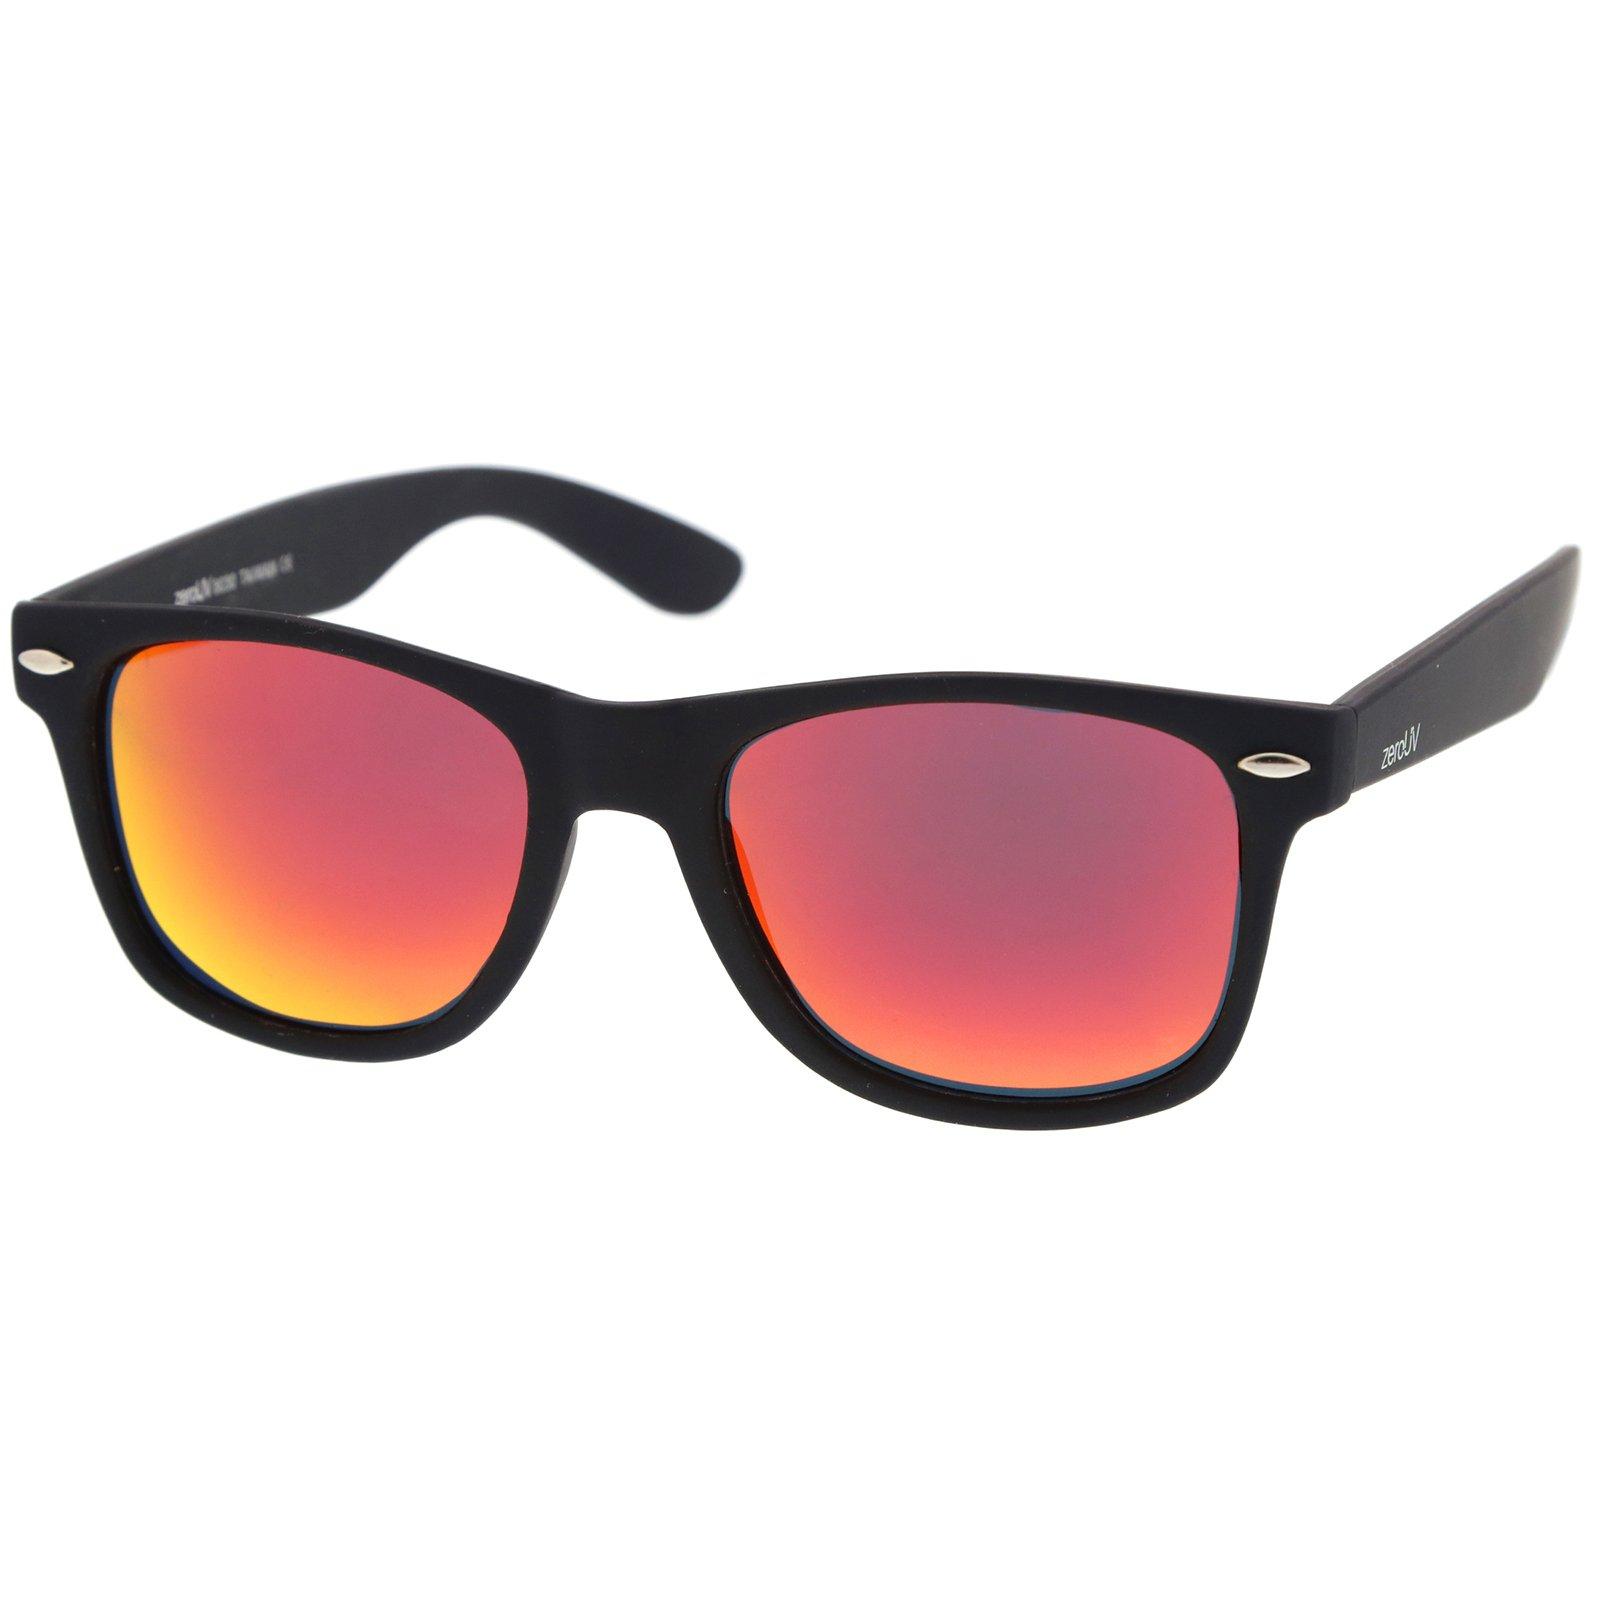 zeroUV - Rubberized Frame Reflective Mirror Polarized Lens Square Horn Rimmed Sunglasses 55mm (Polarized | Rubberized/)